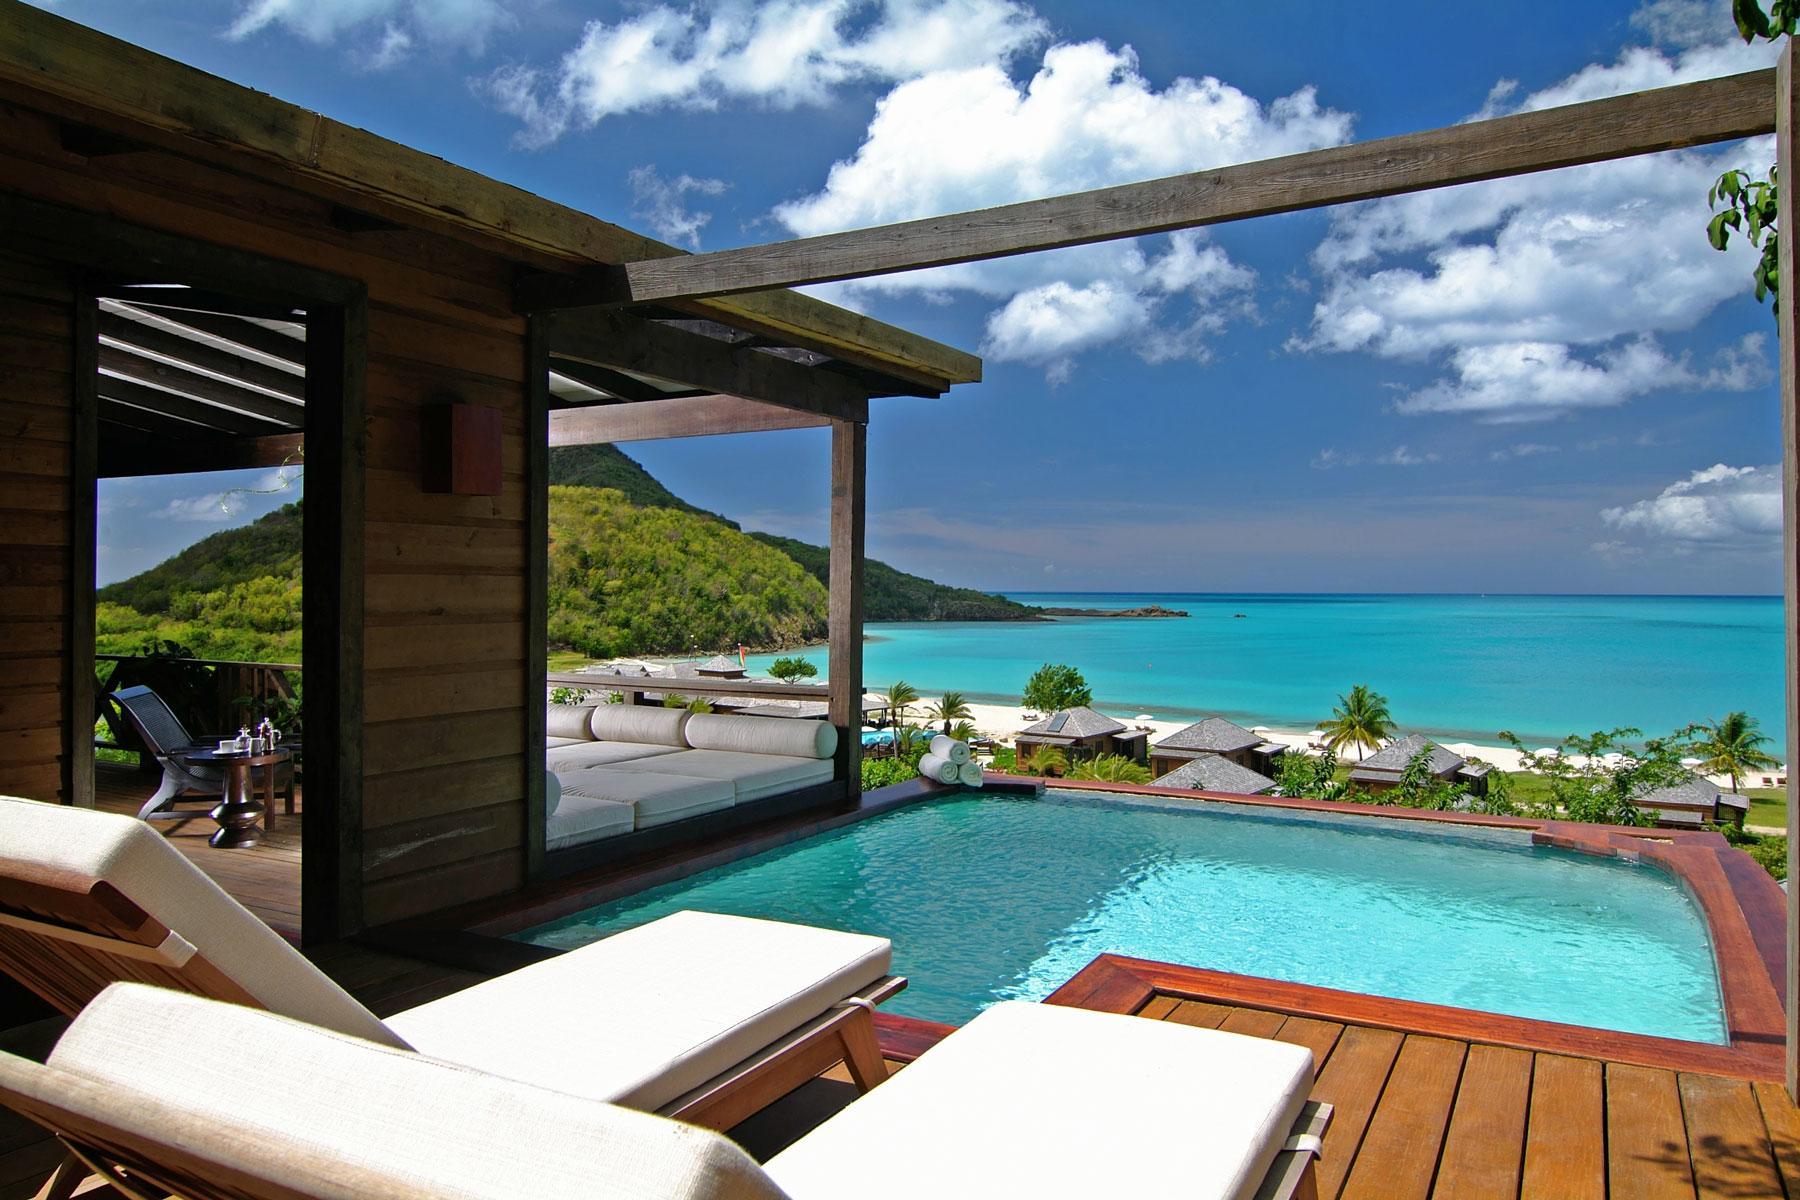 15 Best Luxury AllInclusive Resorts in the Caribbean